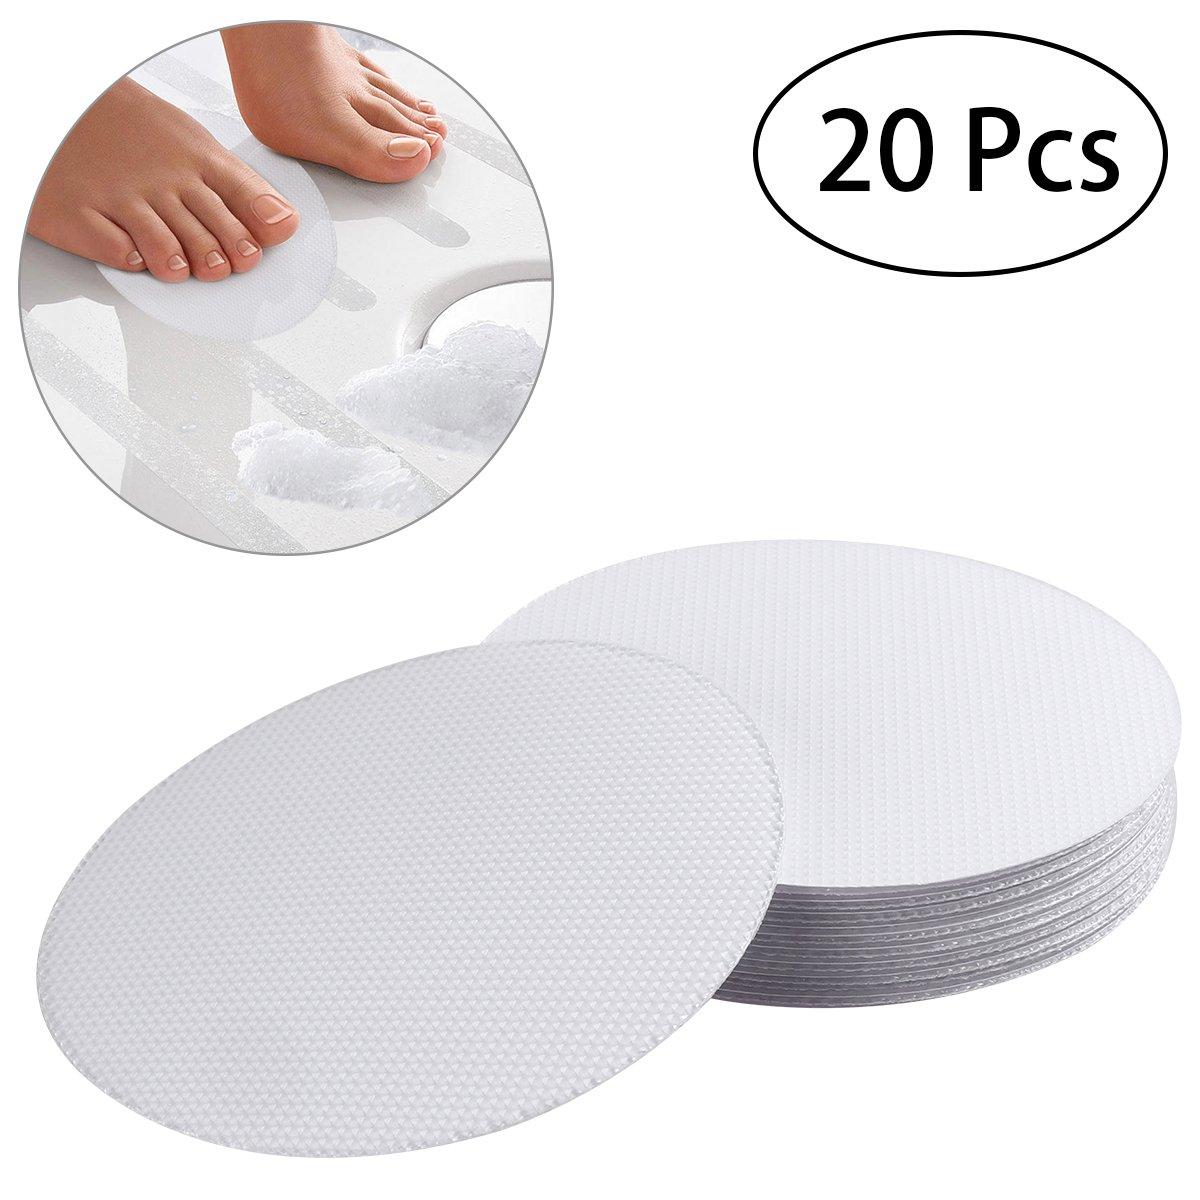 OUNONA 20pcs Anti-slip Stickers Safety Shower Treads Non Slip Stickers For Tubs Bath